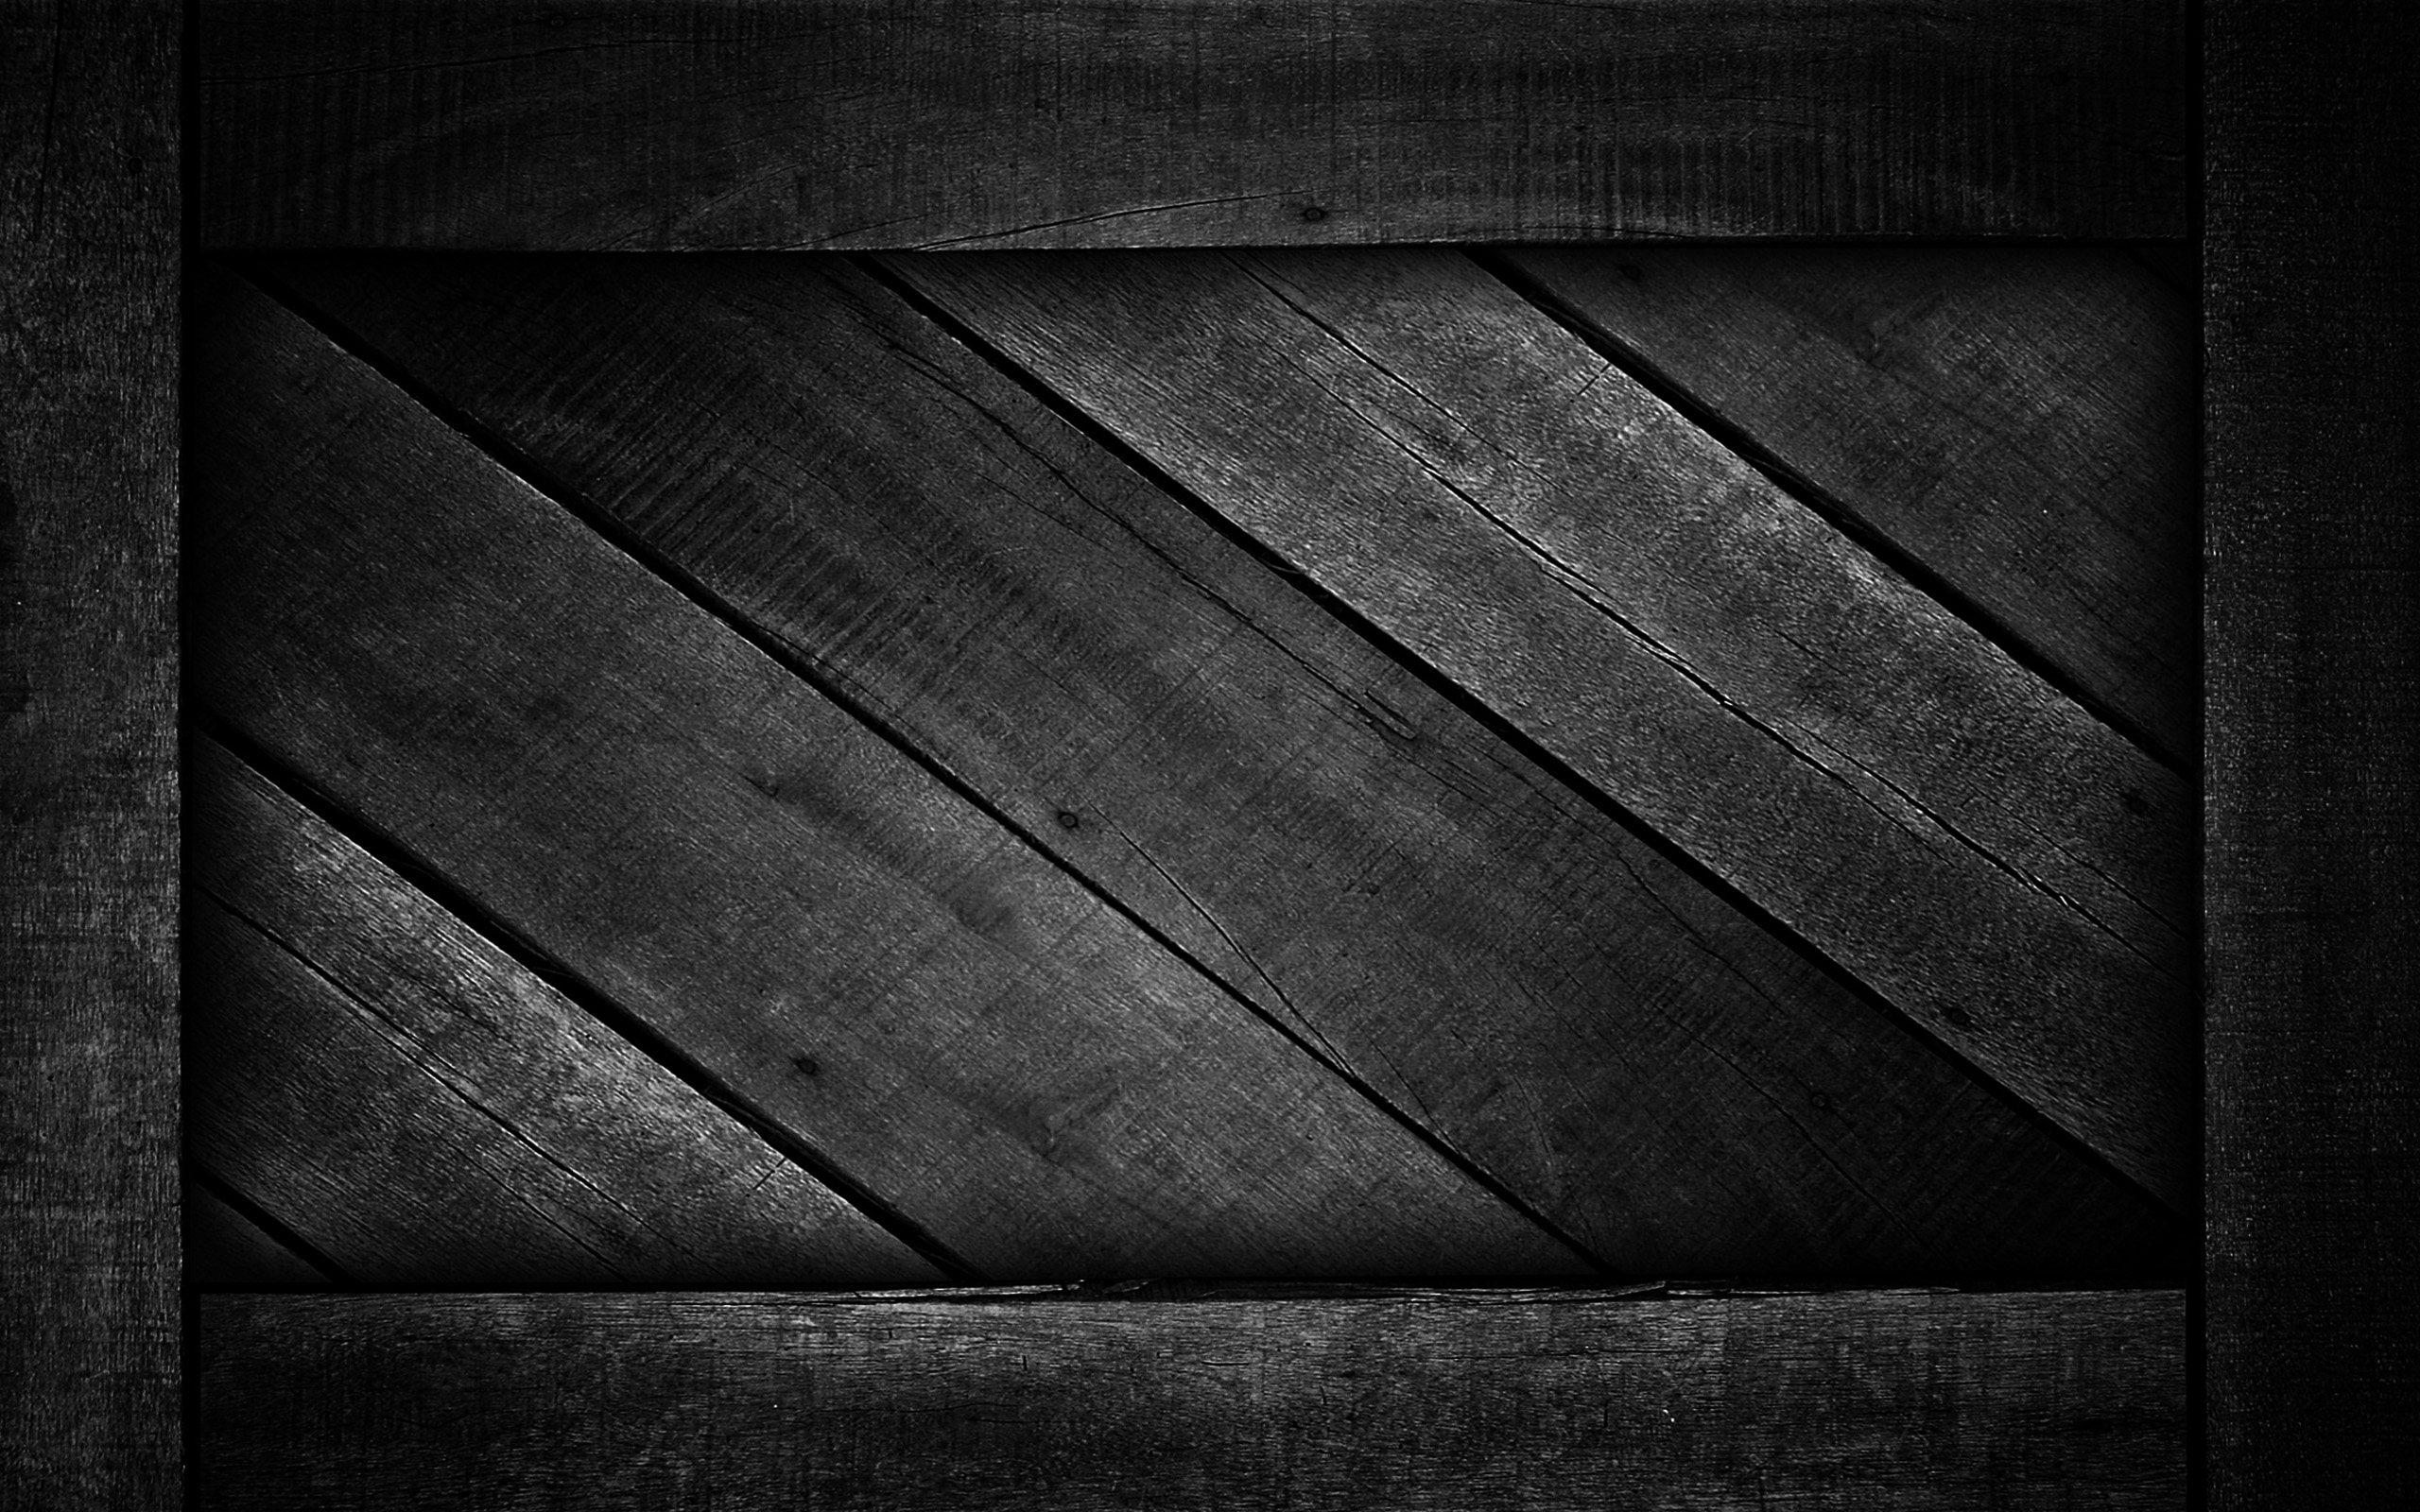 Top Wallpapers 2016: Black Background Image, Popular Black Photos